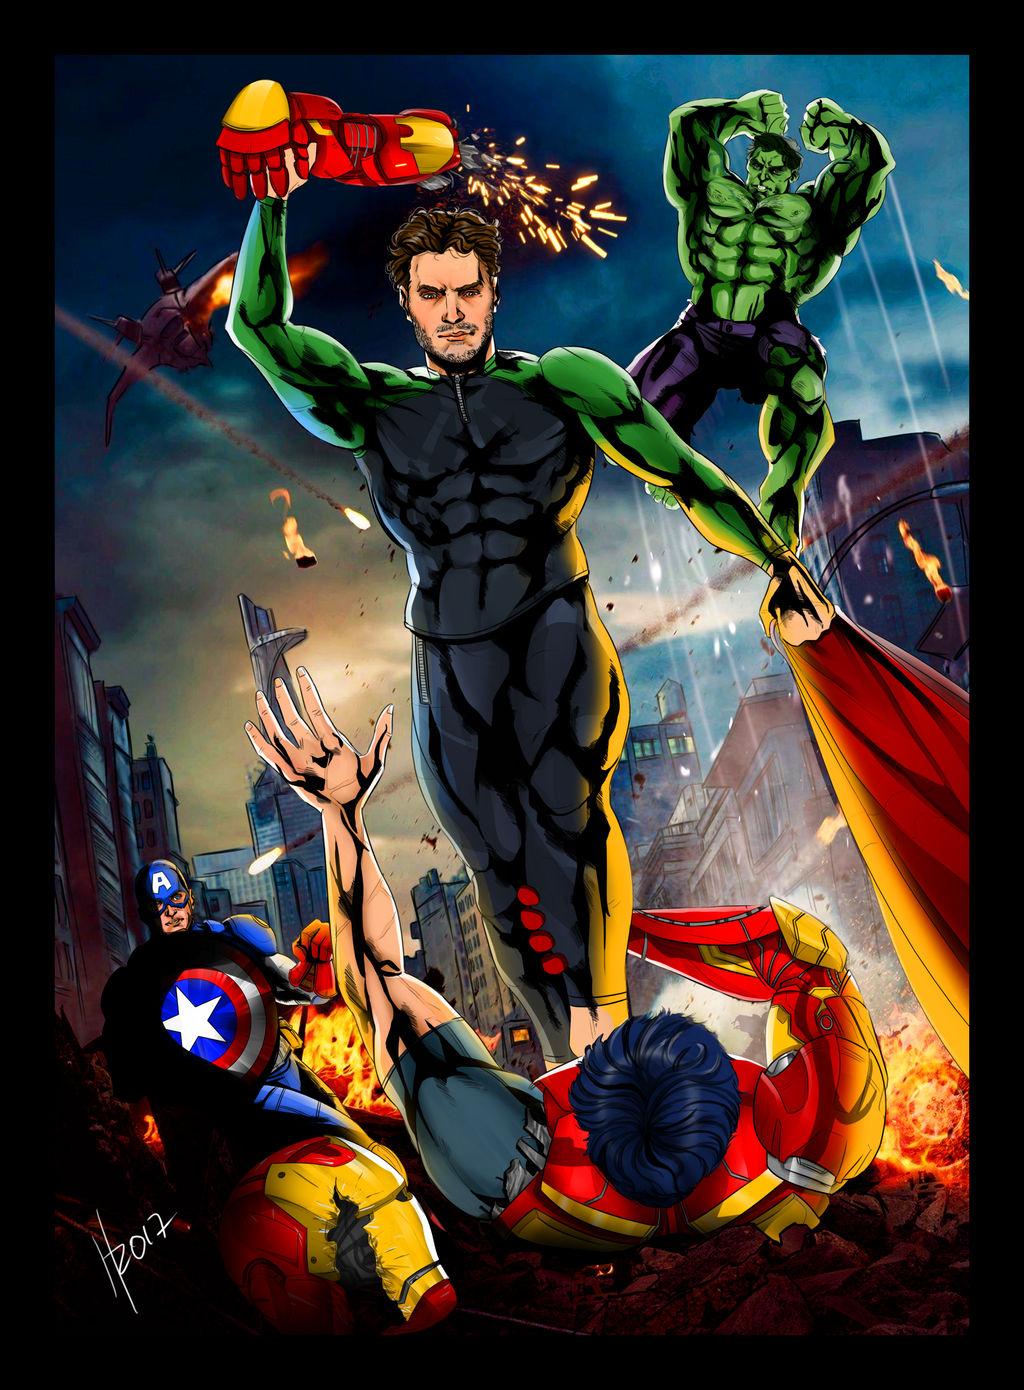 Pain versus the Marvel Universe, again...